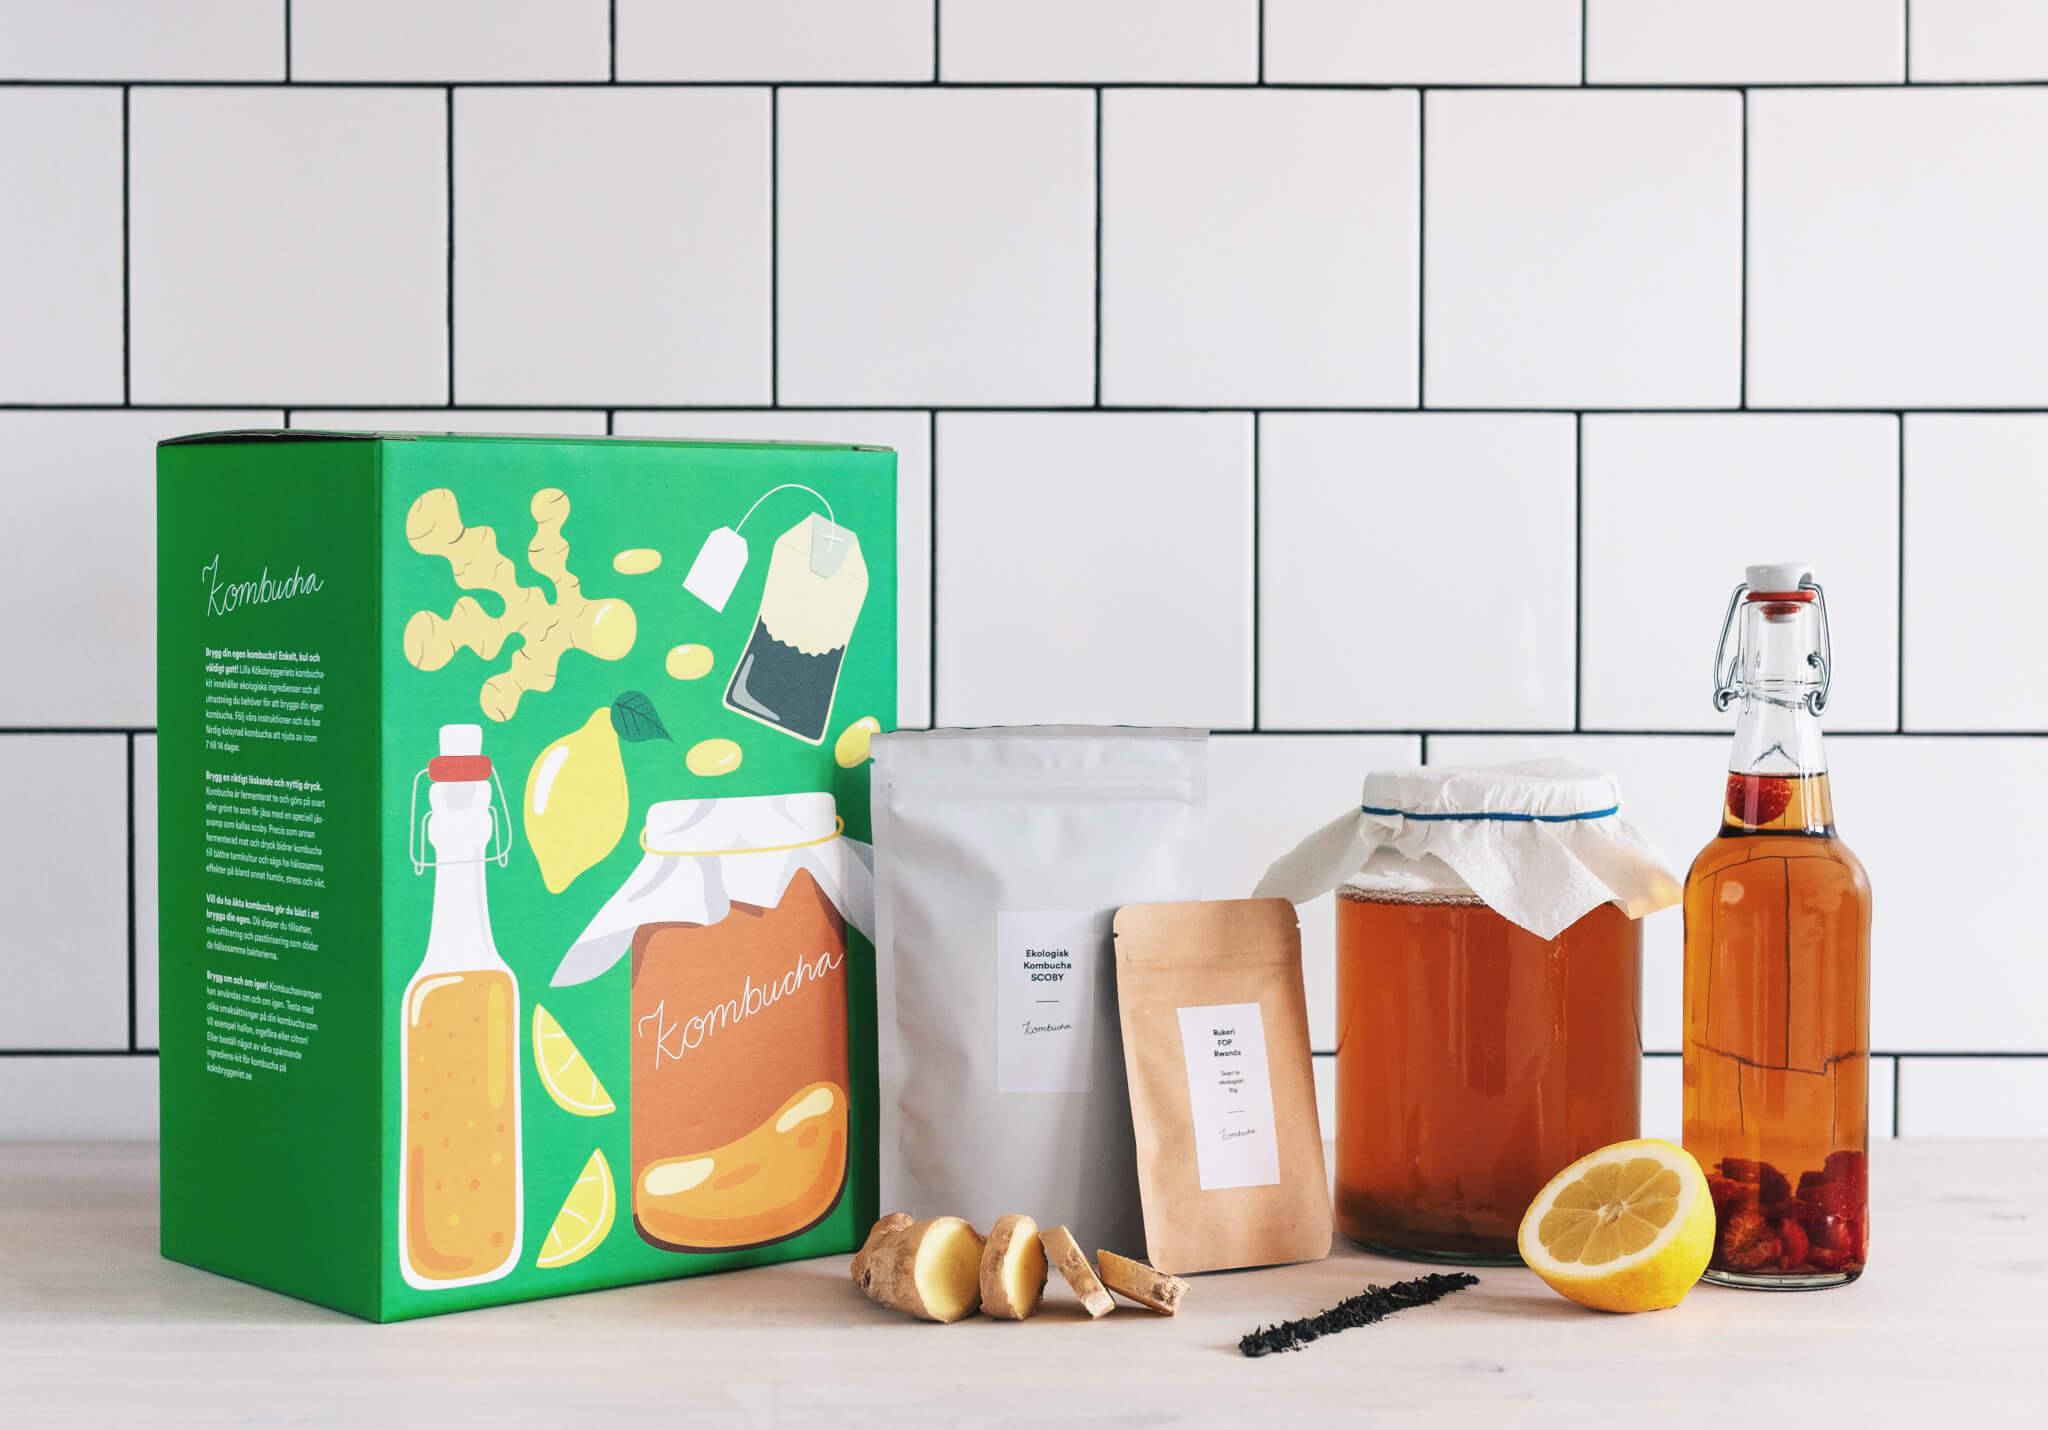 el envase de Det Lilla Köksbryggeriet - packhelp packaging